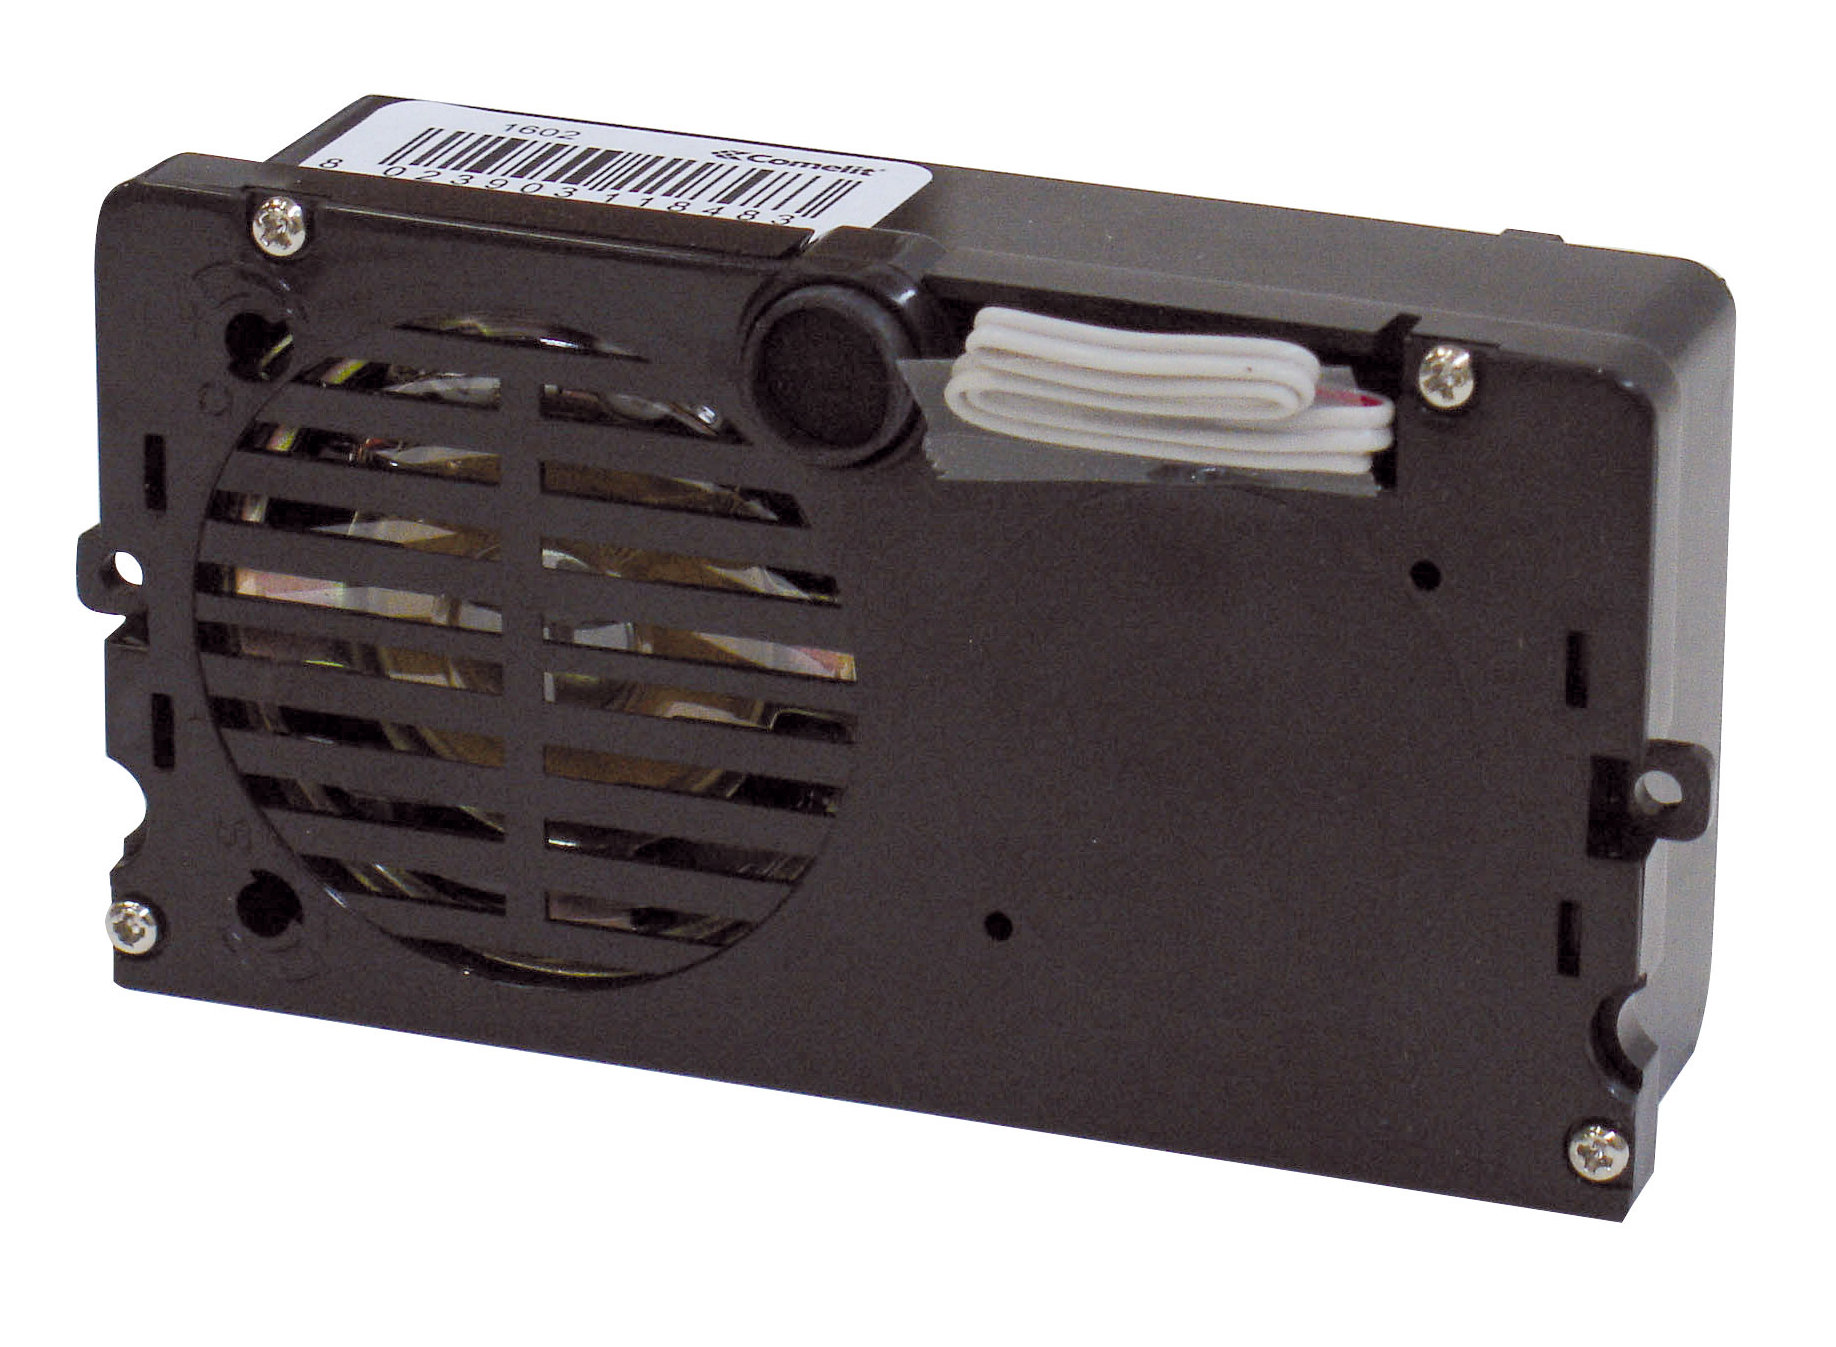 1 Stk Lautsprechermodul, Simplebus, Powercom/Vandalcom SP160200--